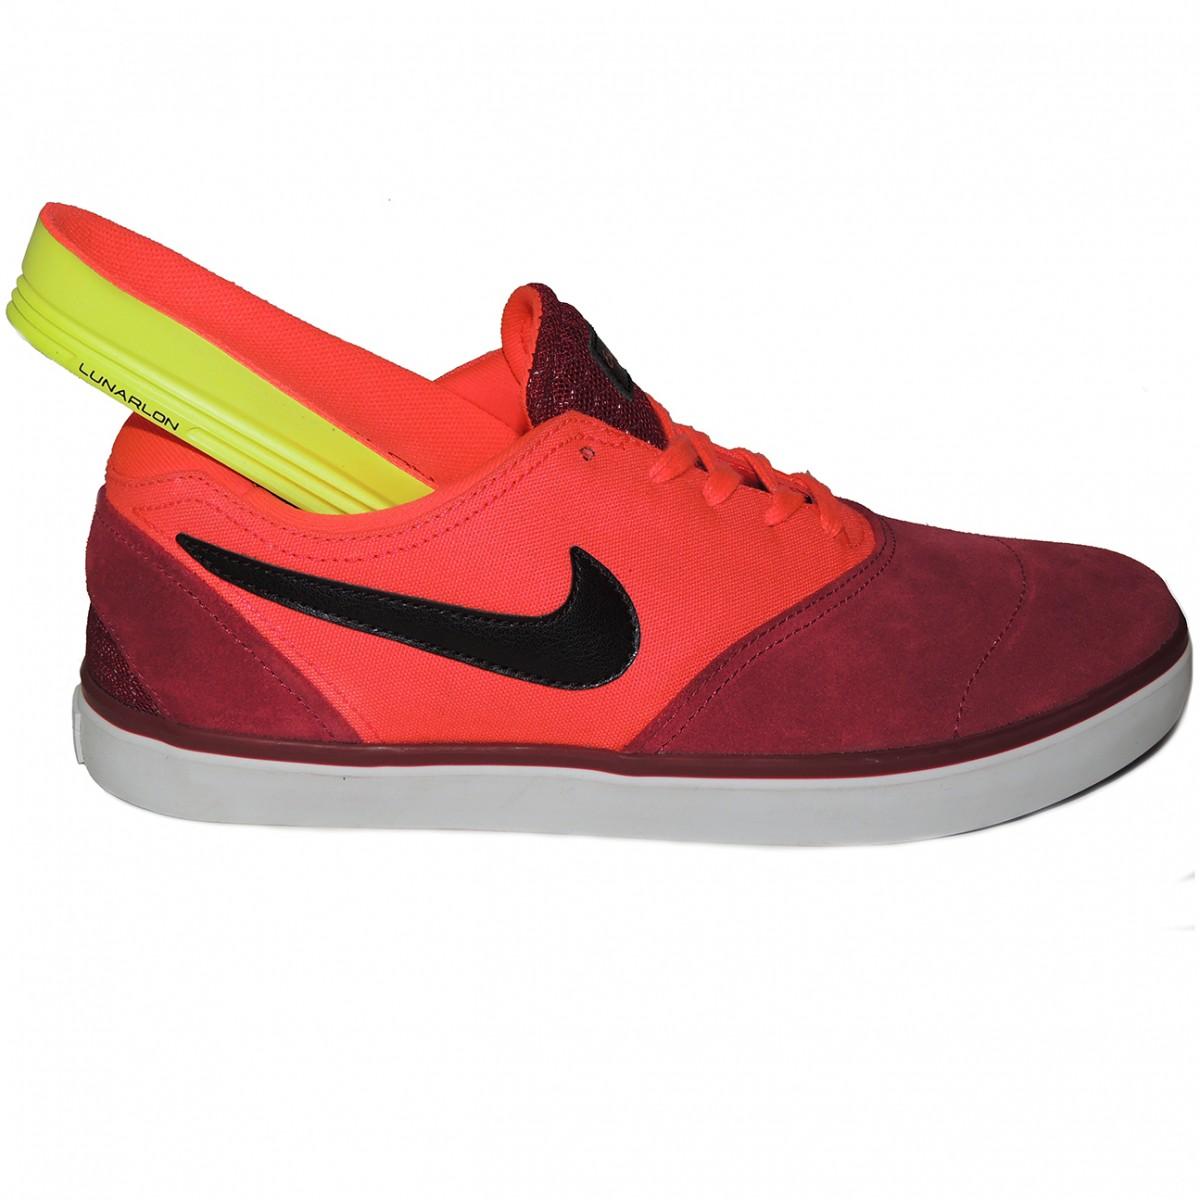 Nike Eric Koston 2 Rouge Foncé Lr 5XWqXt6M